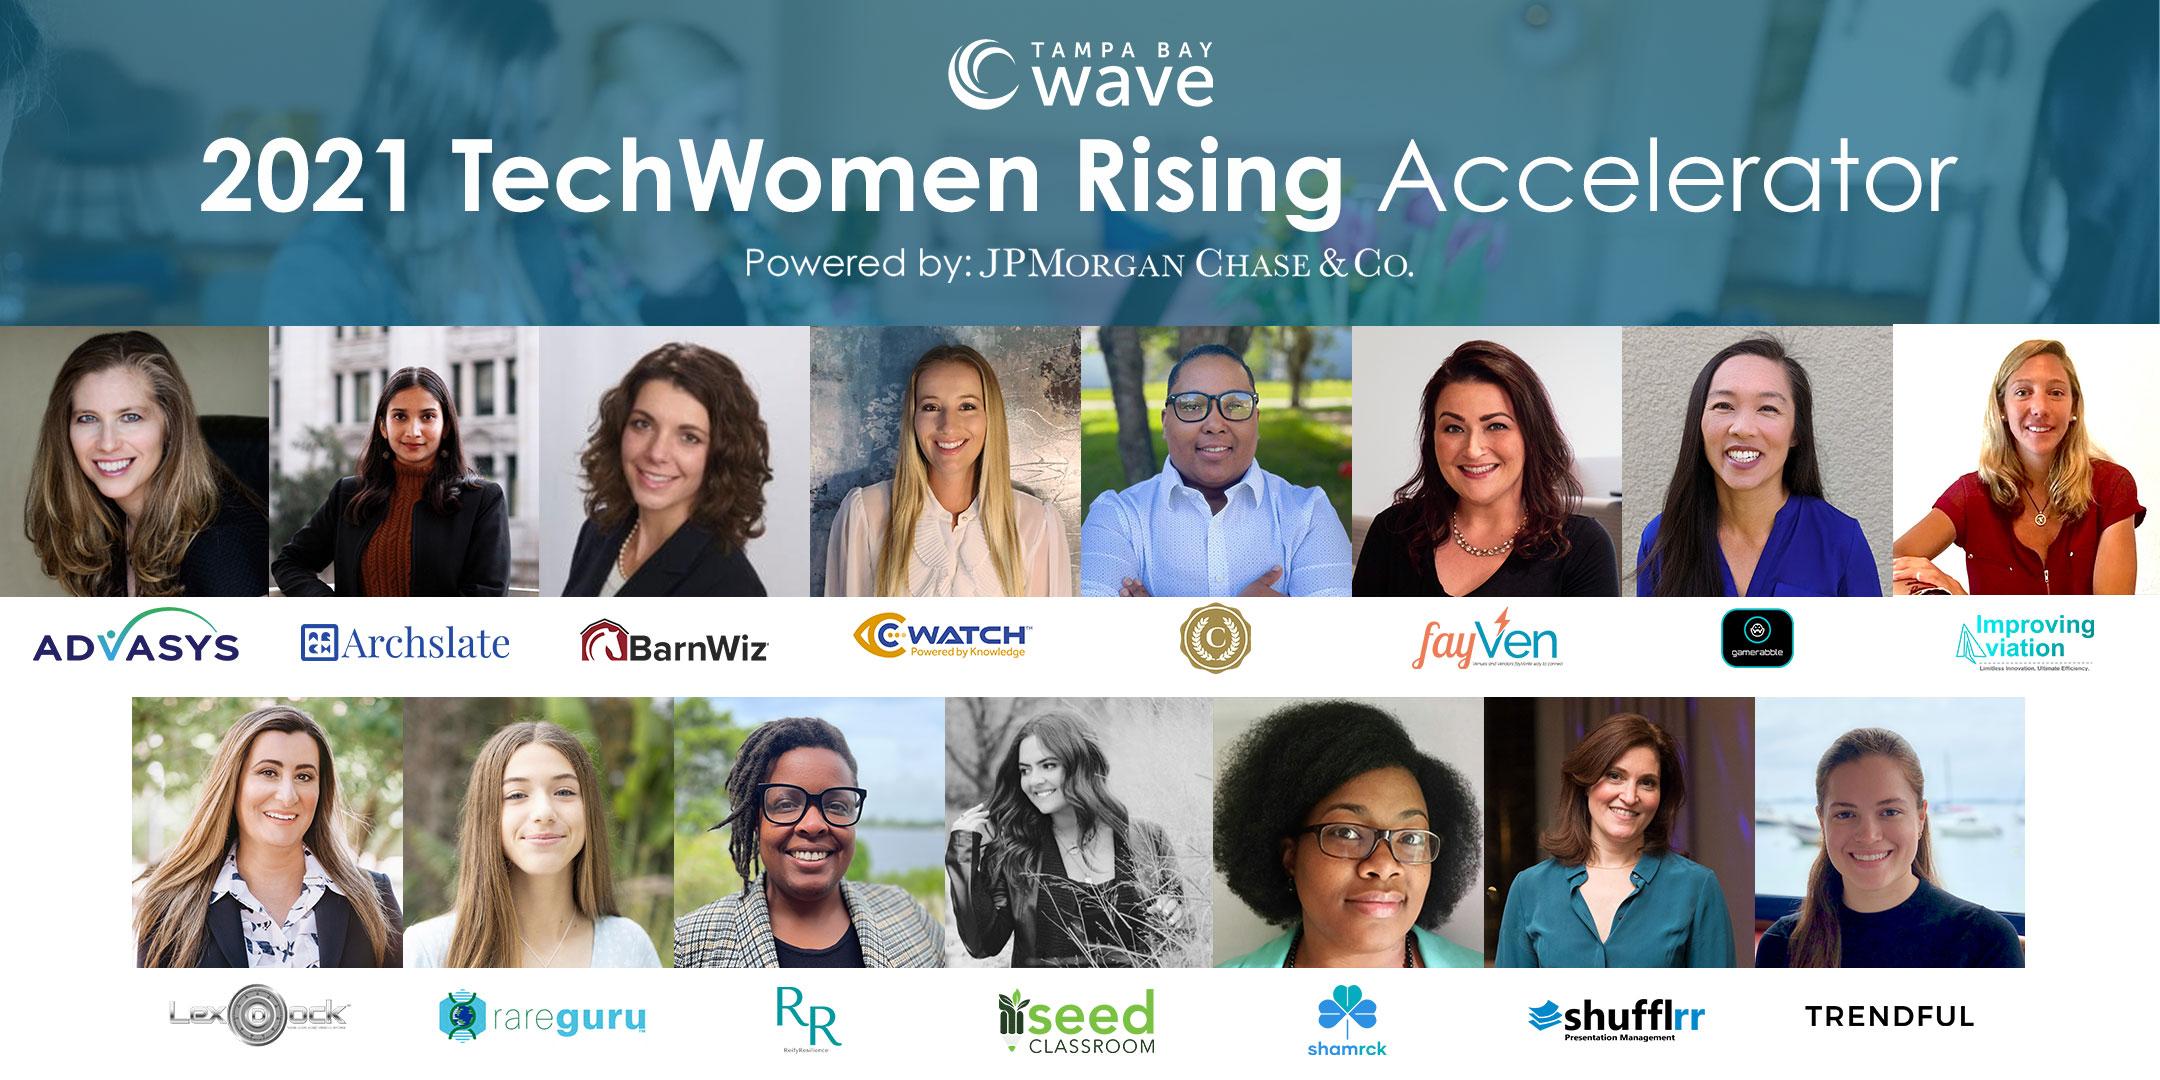 Tampa Bay Wave - 2021 TechWomen Rising Accelerator Cohort